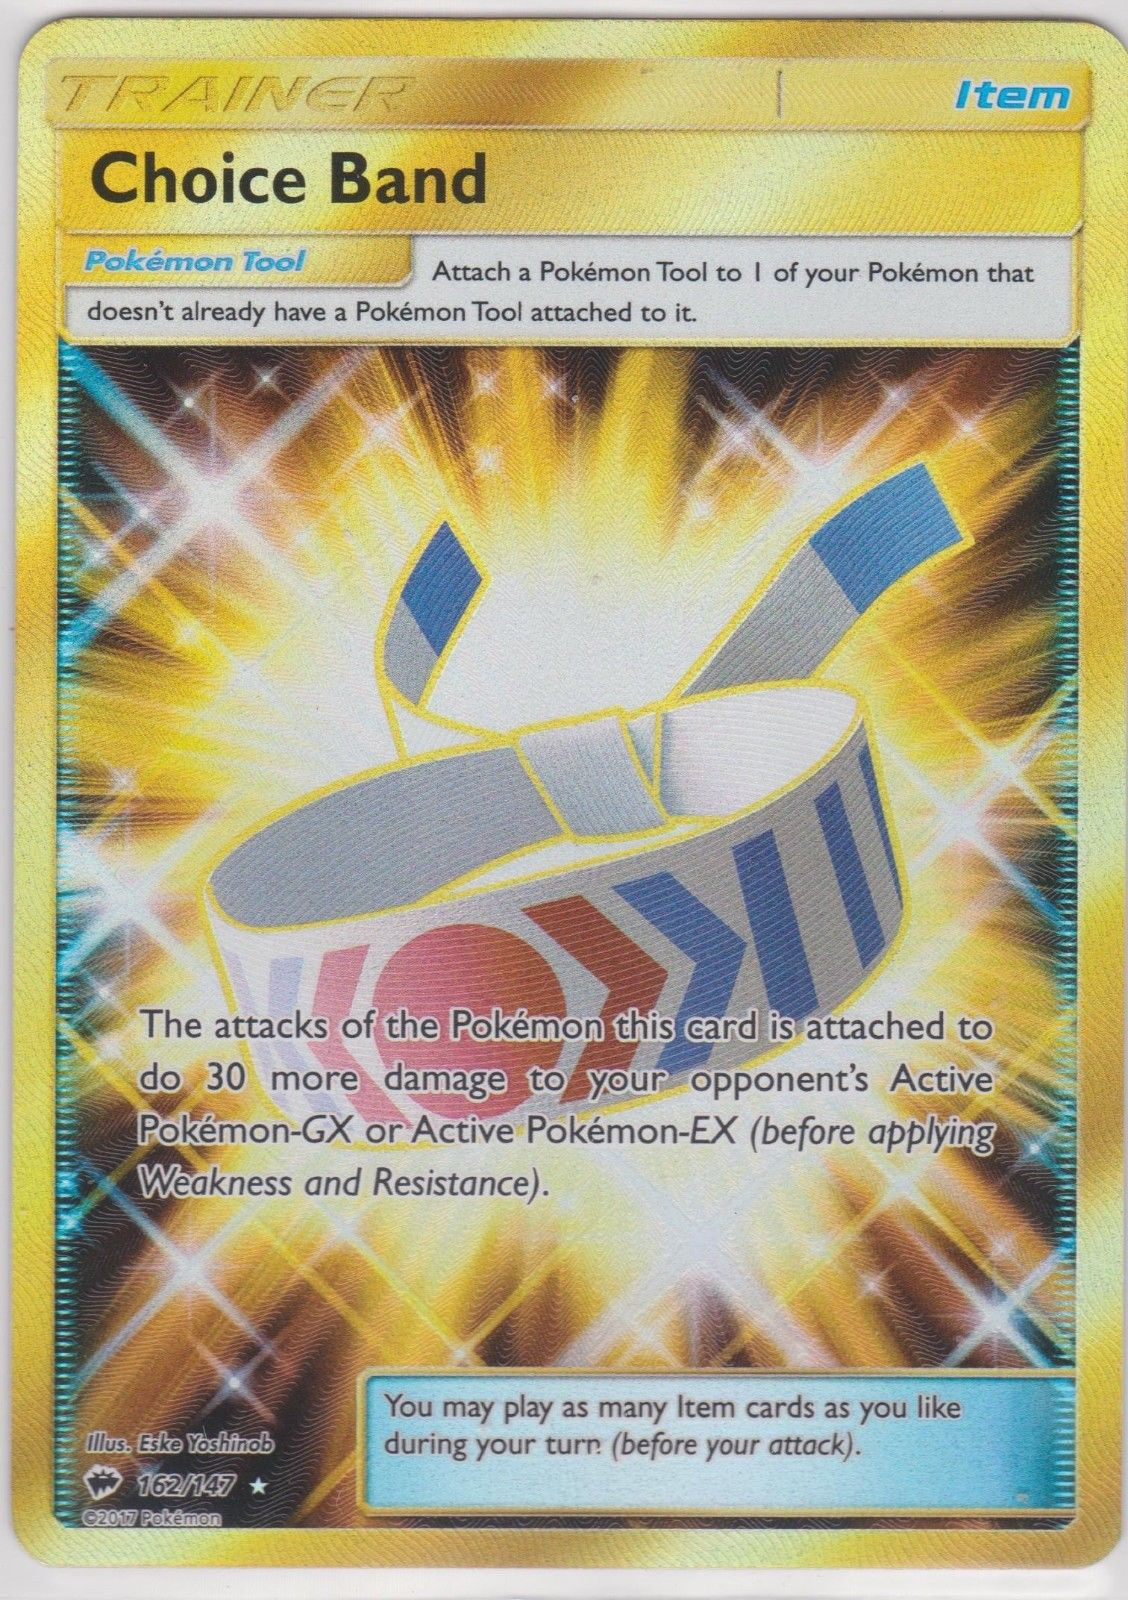 162//147 Secret Rare Quase Perfeito-Estado perfeito Pokemon SM03-Burning Shadows 1x Choice Band